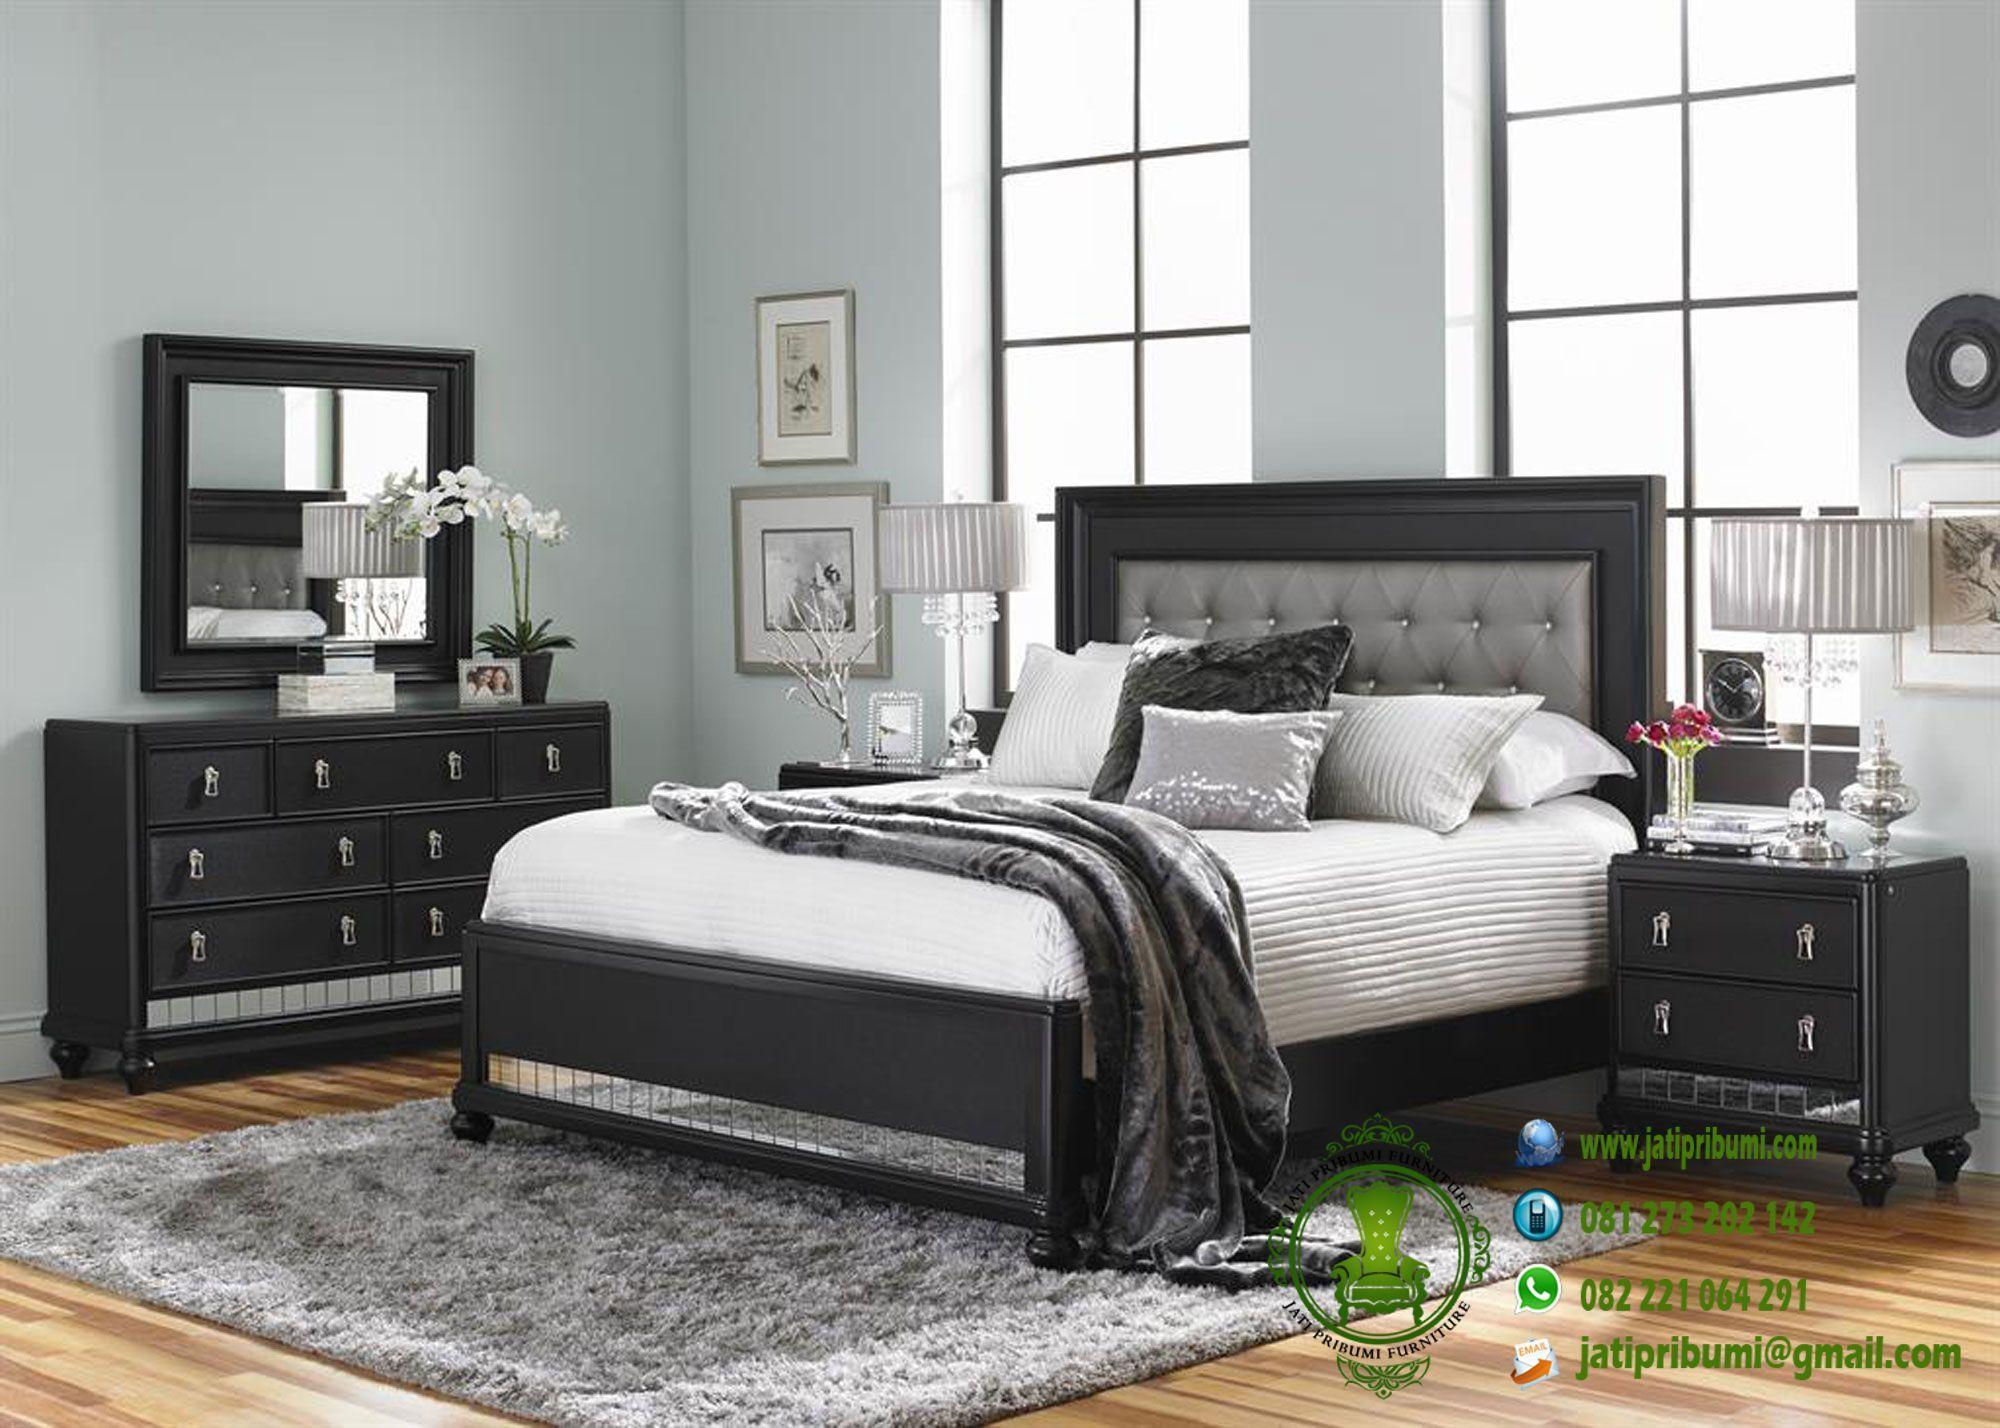 Set Tempat Tidur Minimalis Warna Hitam Set